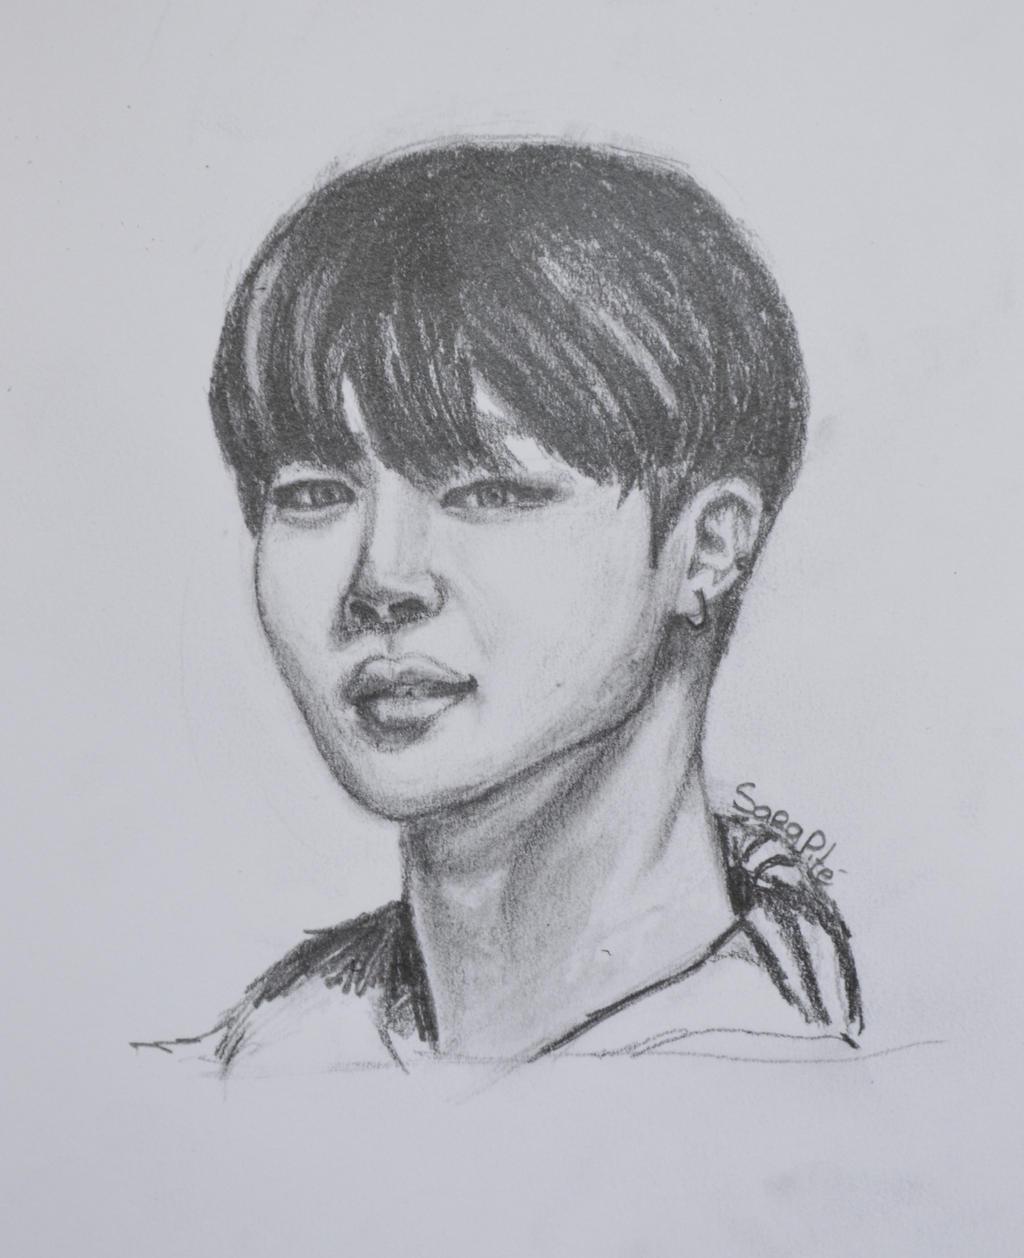 BTS - Park Jimin Drawing By Sarapite On DeviantArt